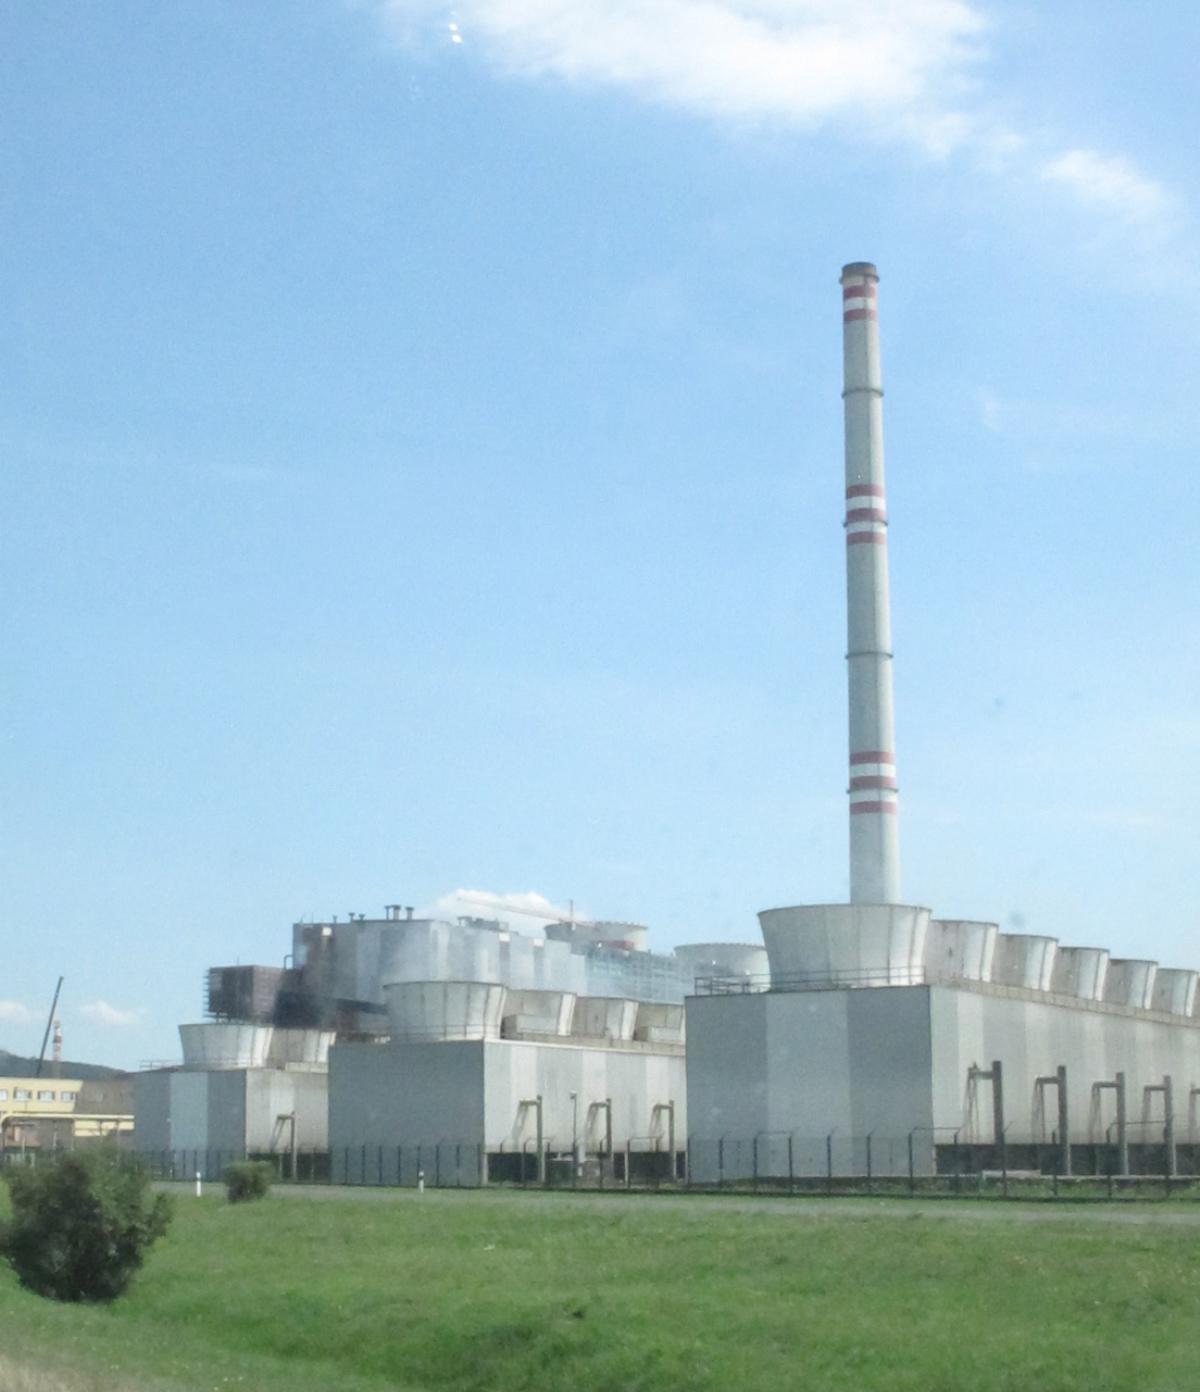 Czech power plants - possibly nuclear?